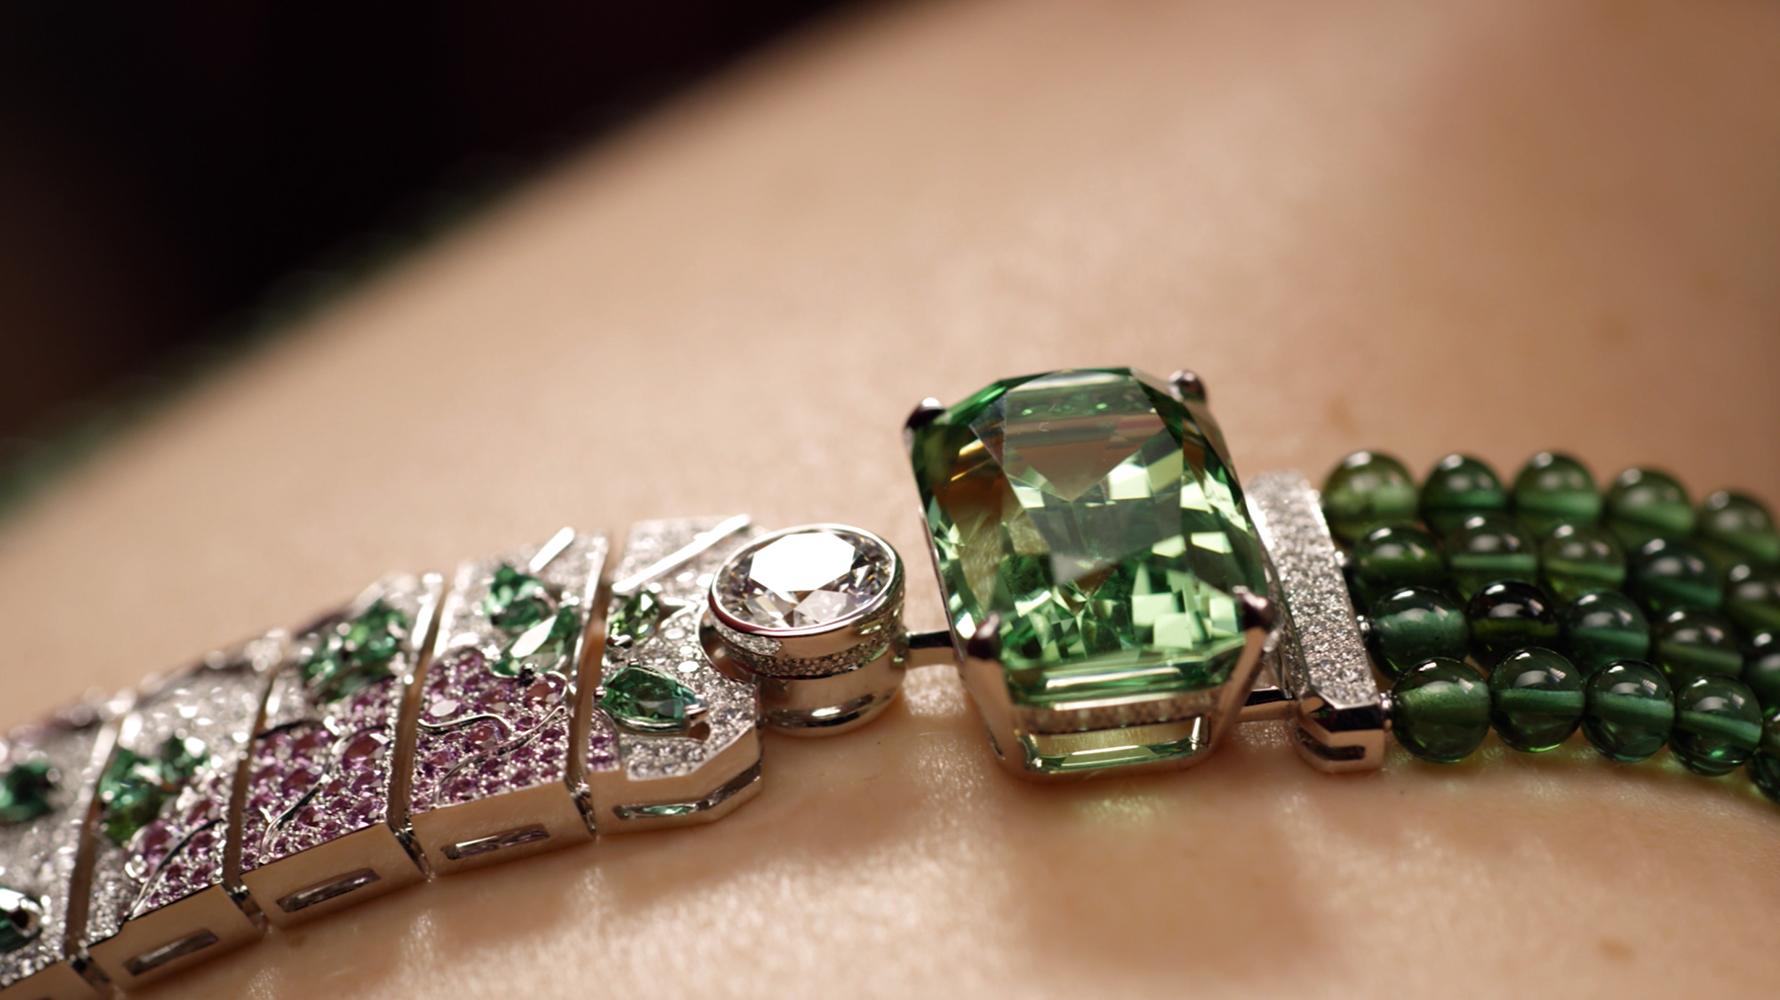 5_CHANEL_Coromandel-Legend_green_gem_necklace